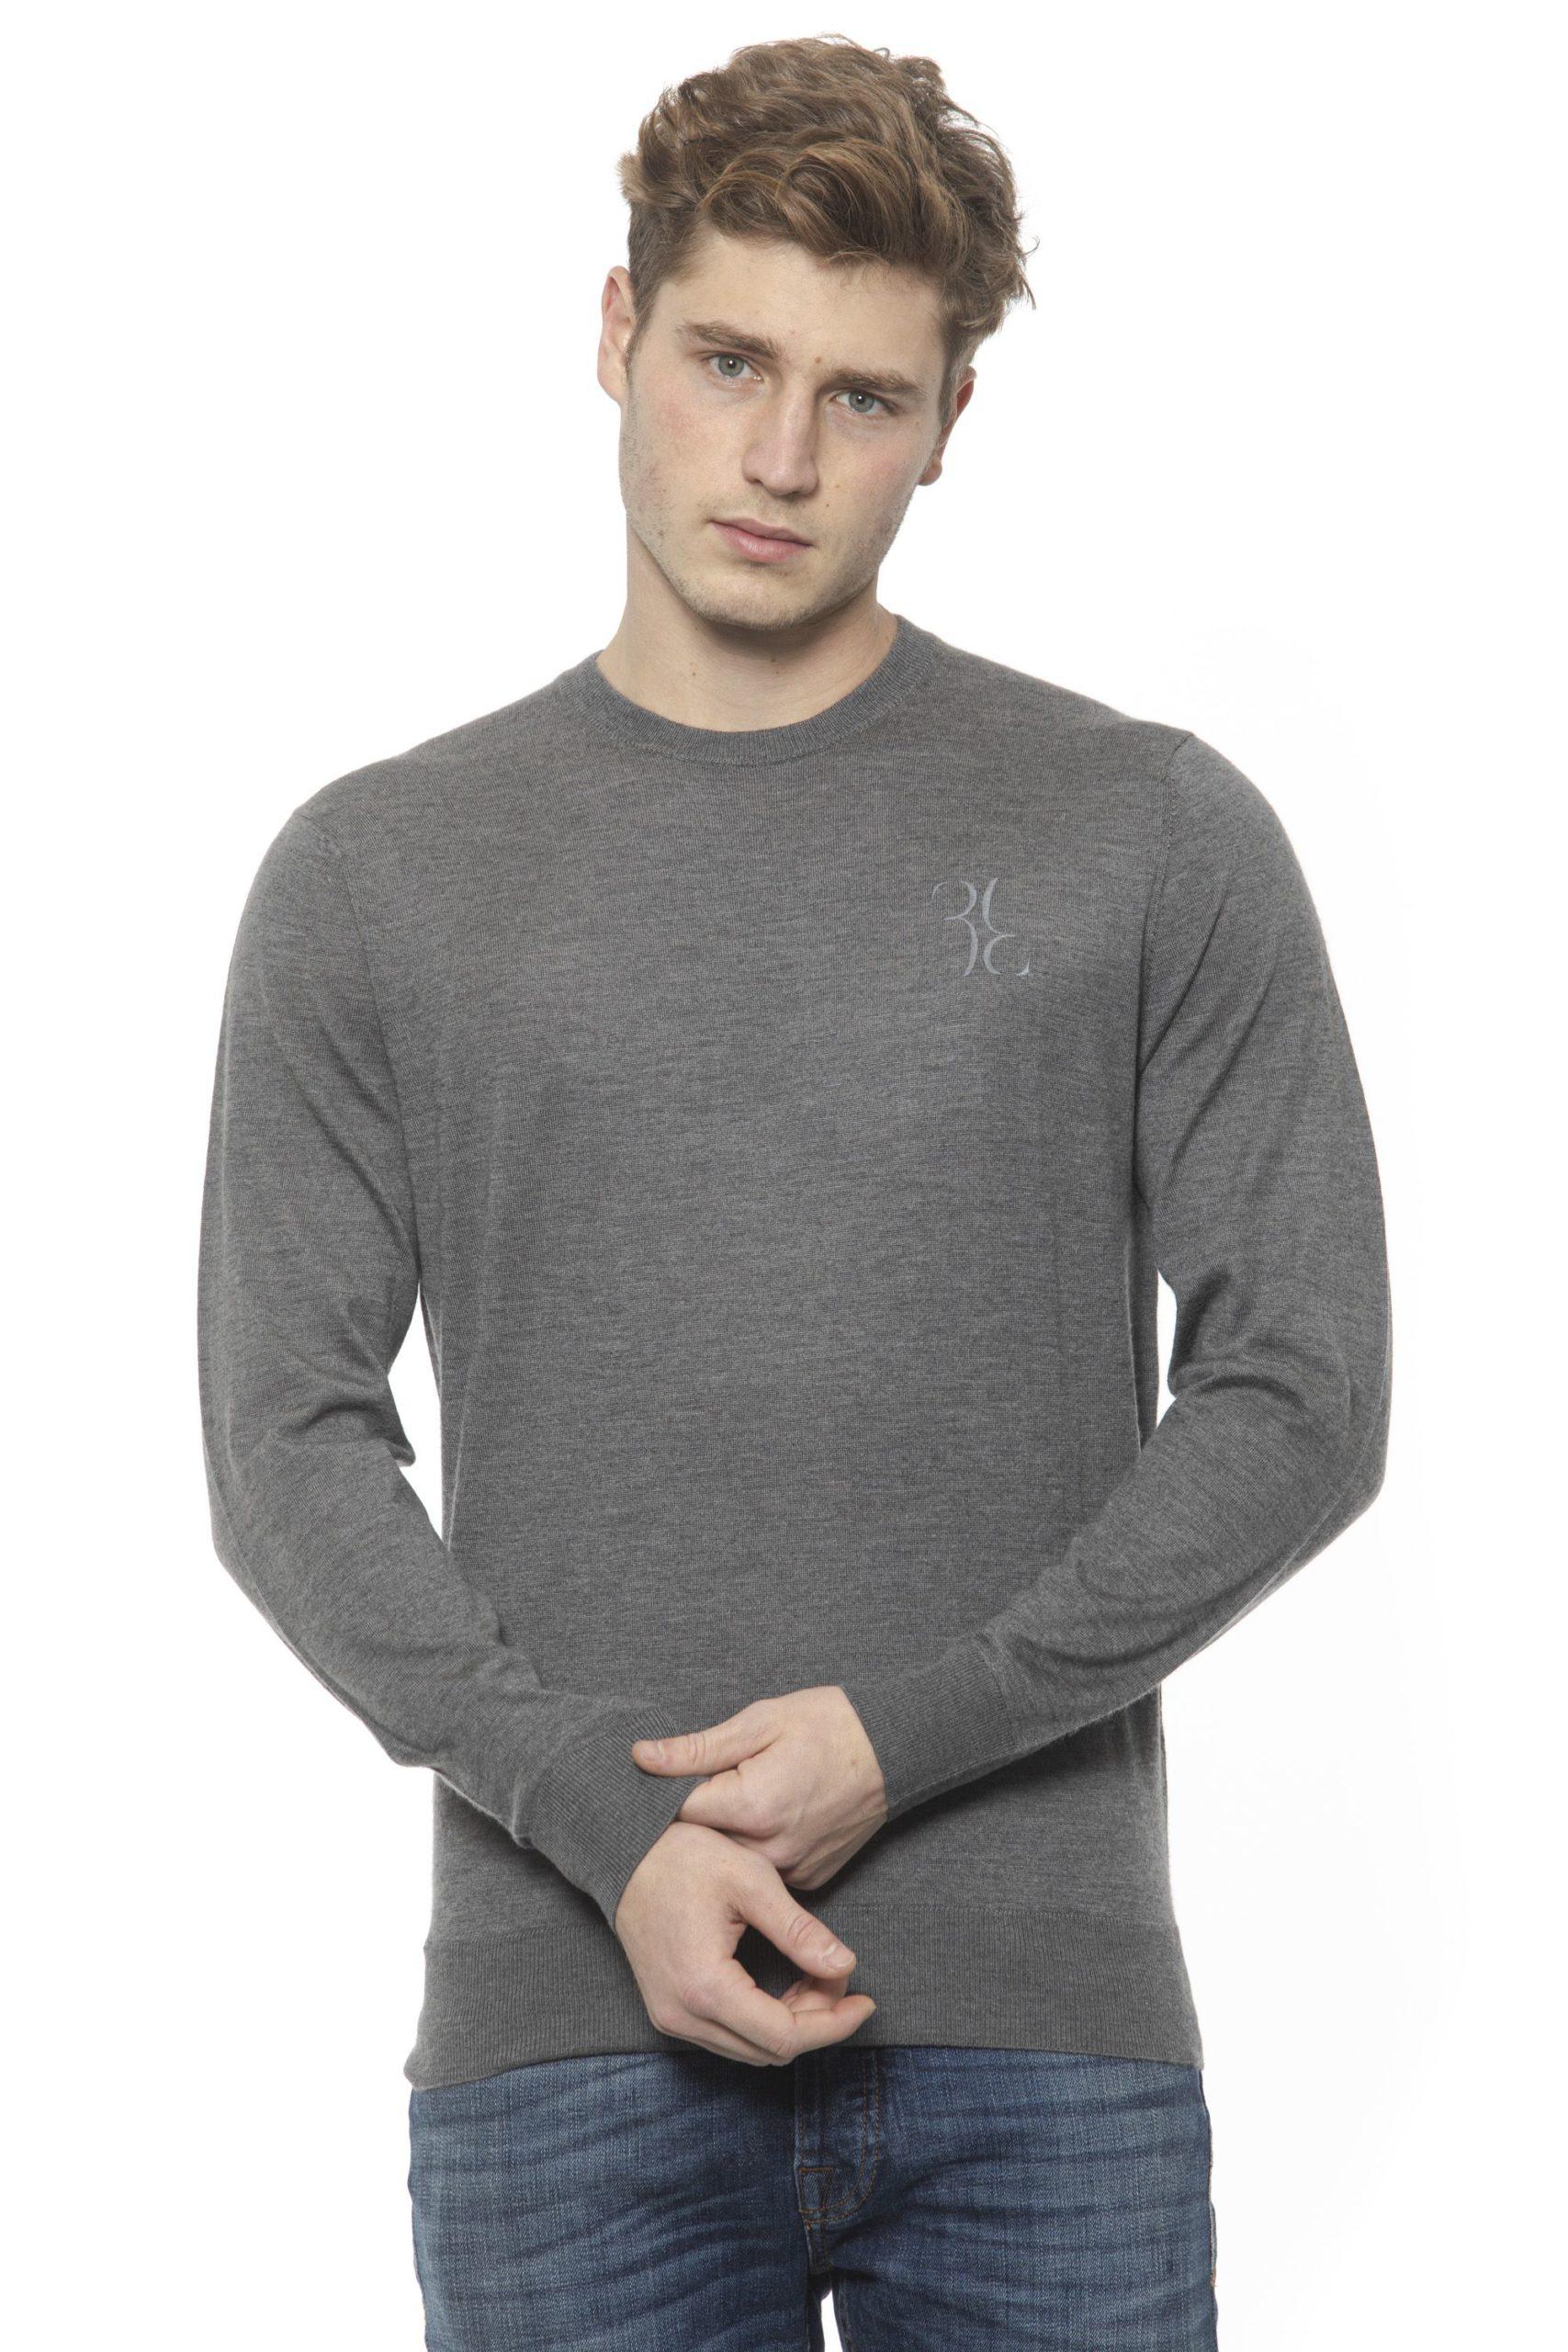 Billionaire Italian Couture Men's Grigio Sweater Grey BI1313558 - M